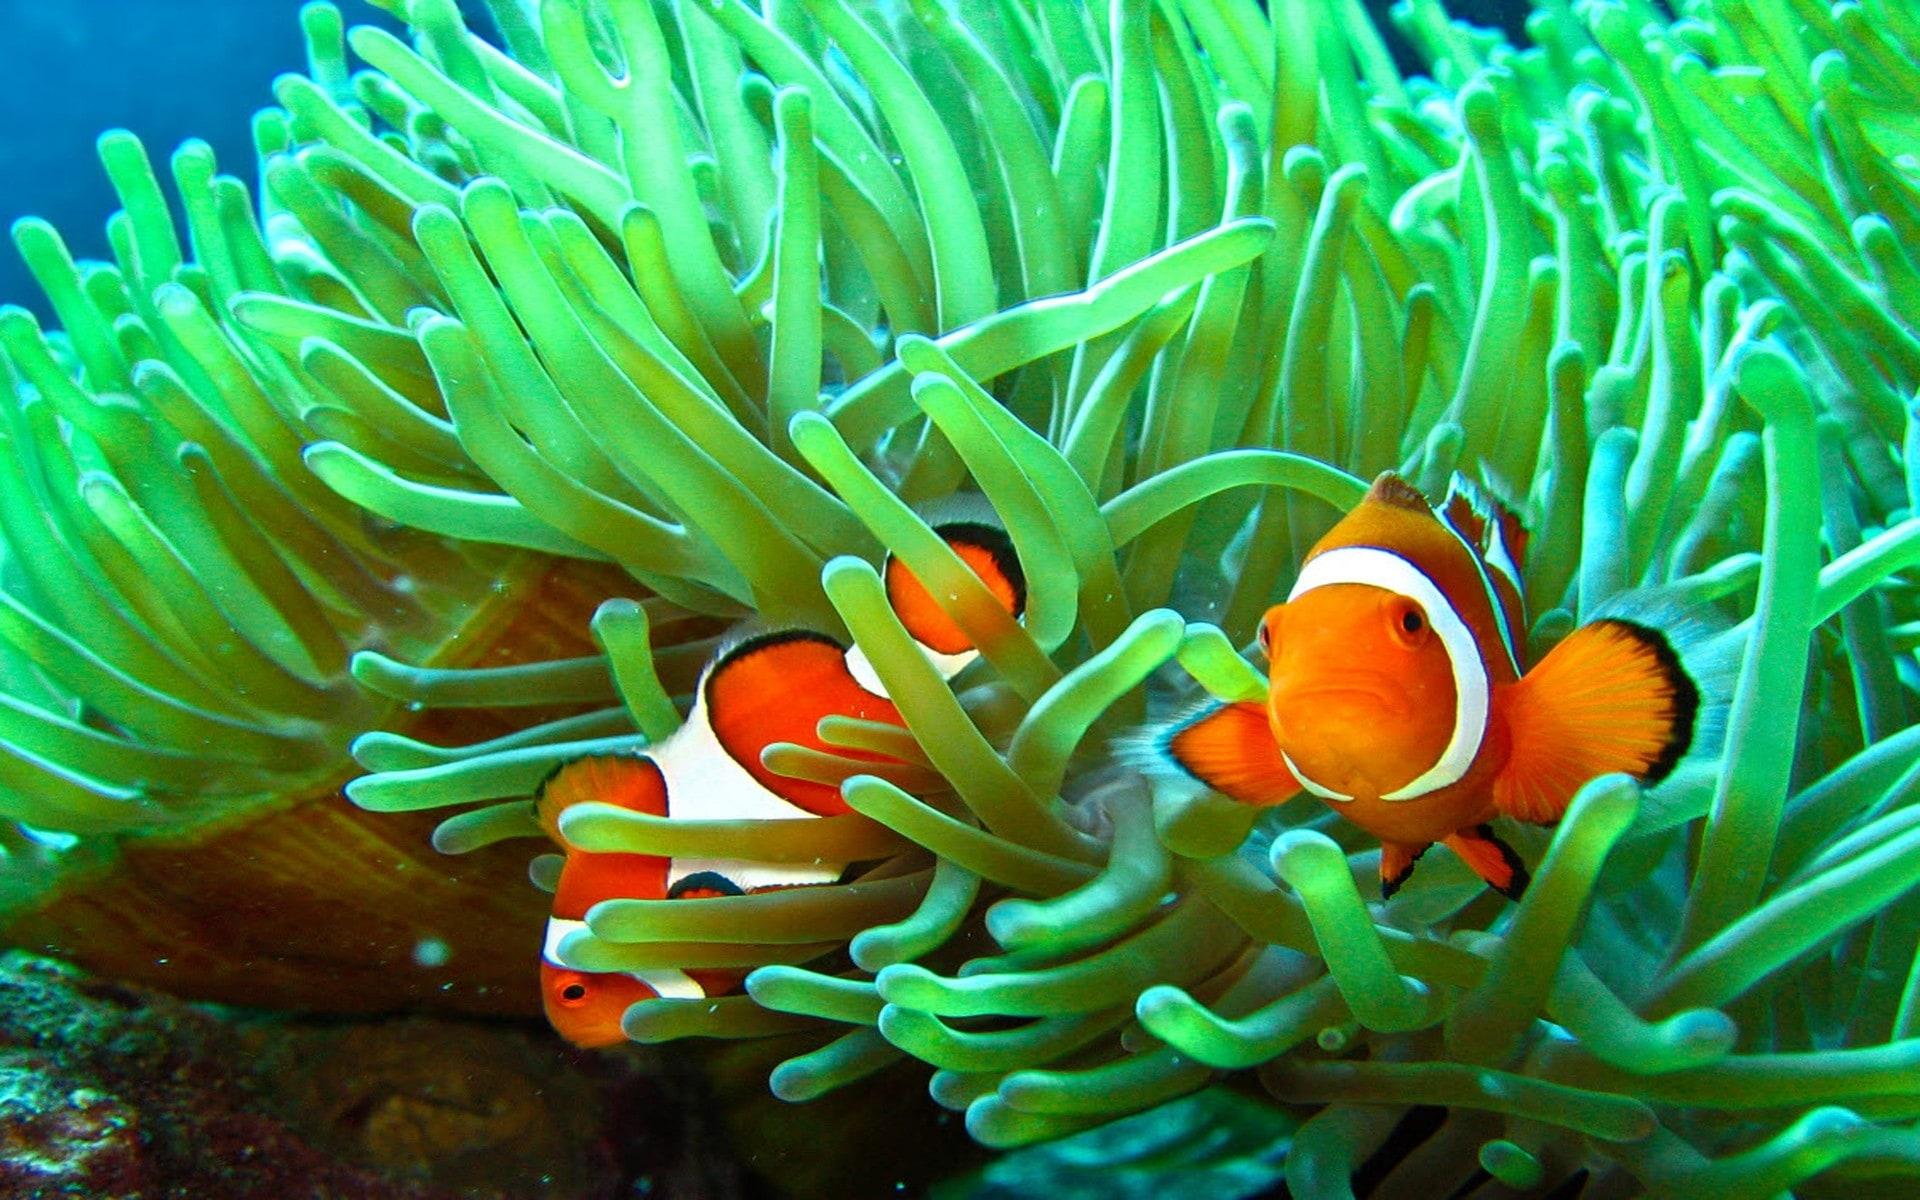 Clownfish Hd Wallpapers 7wallpapersnet